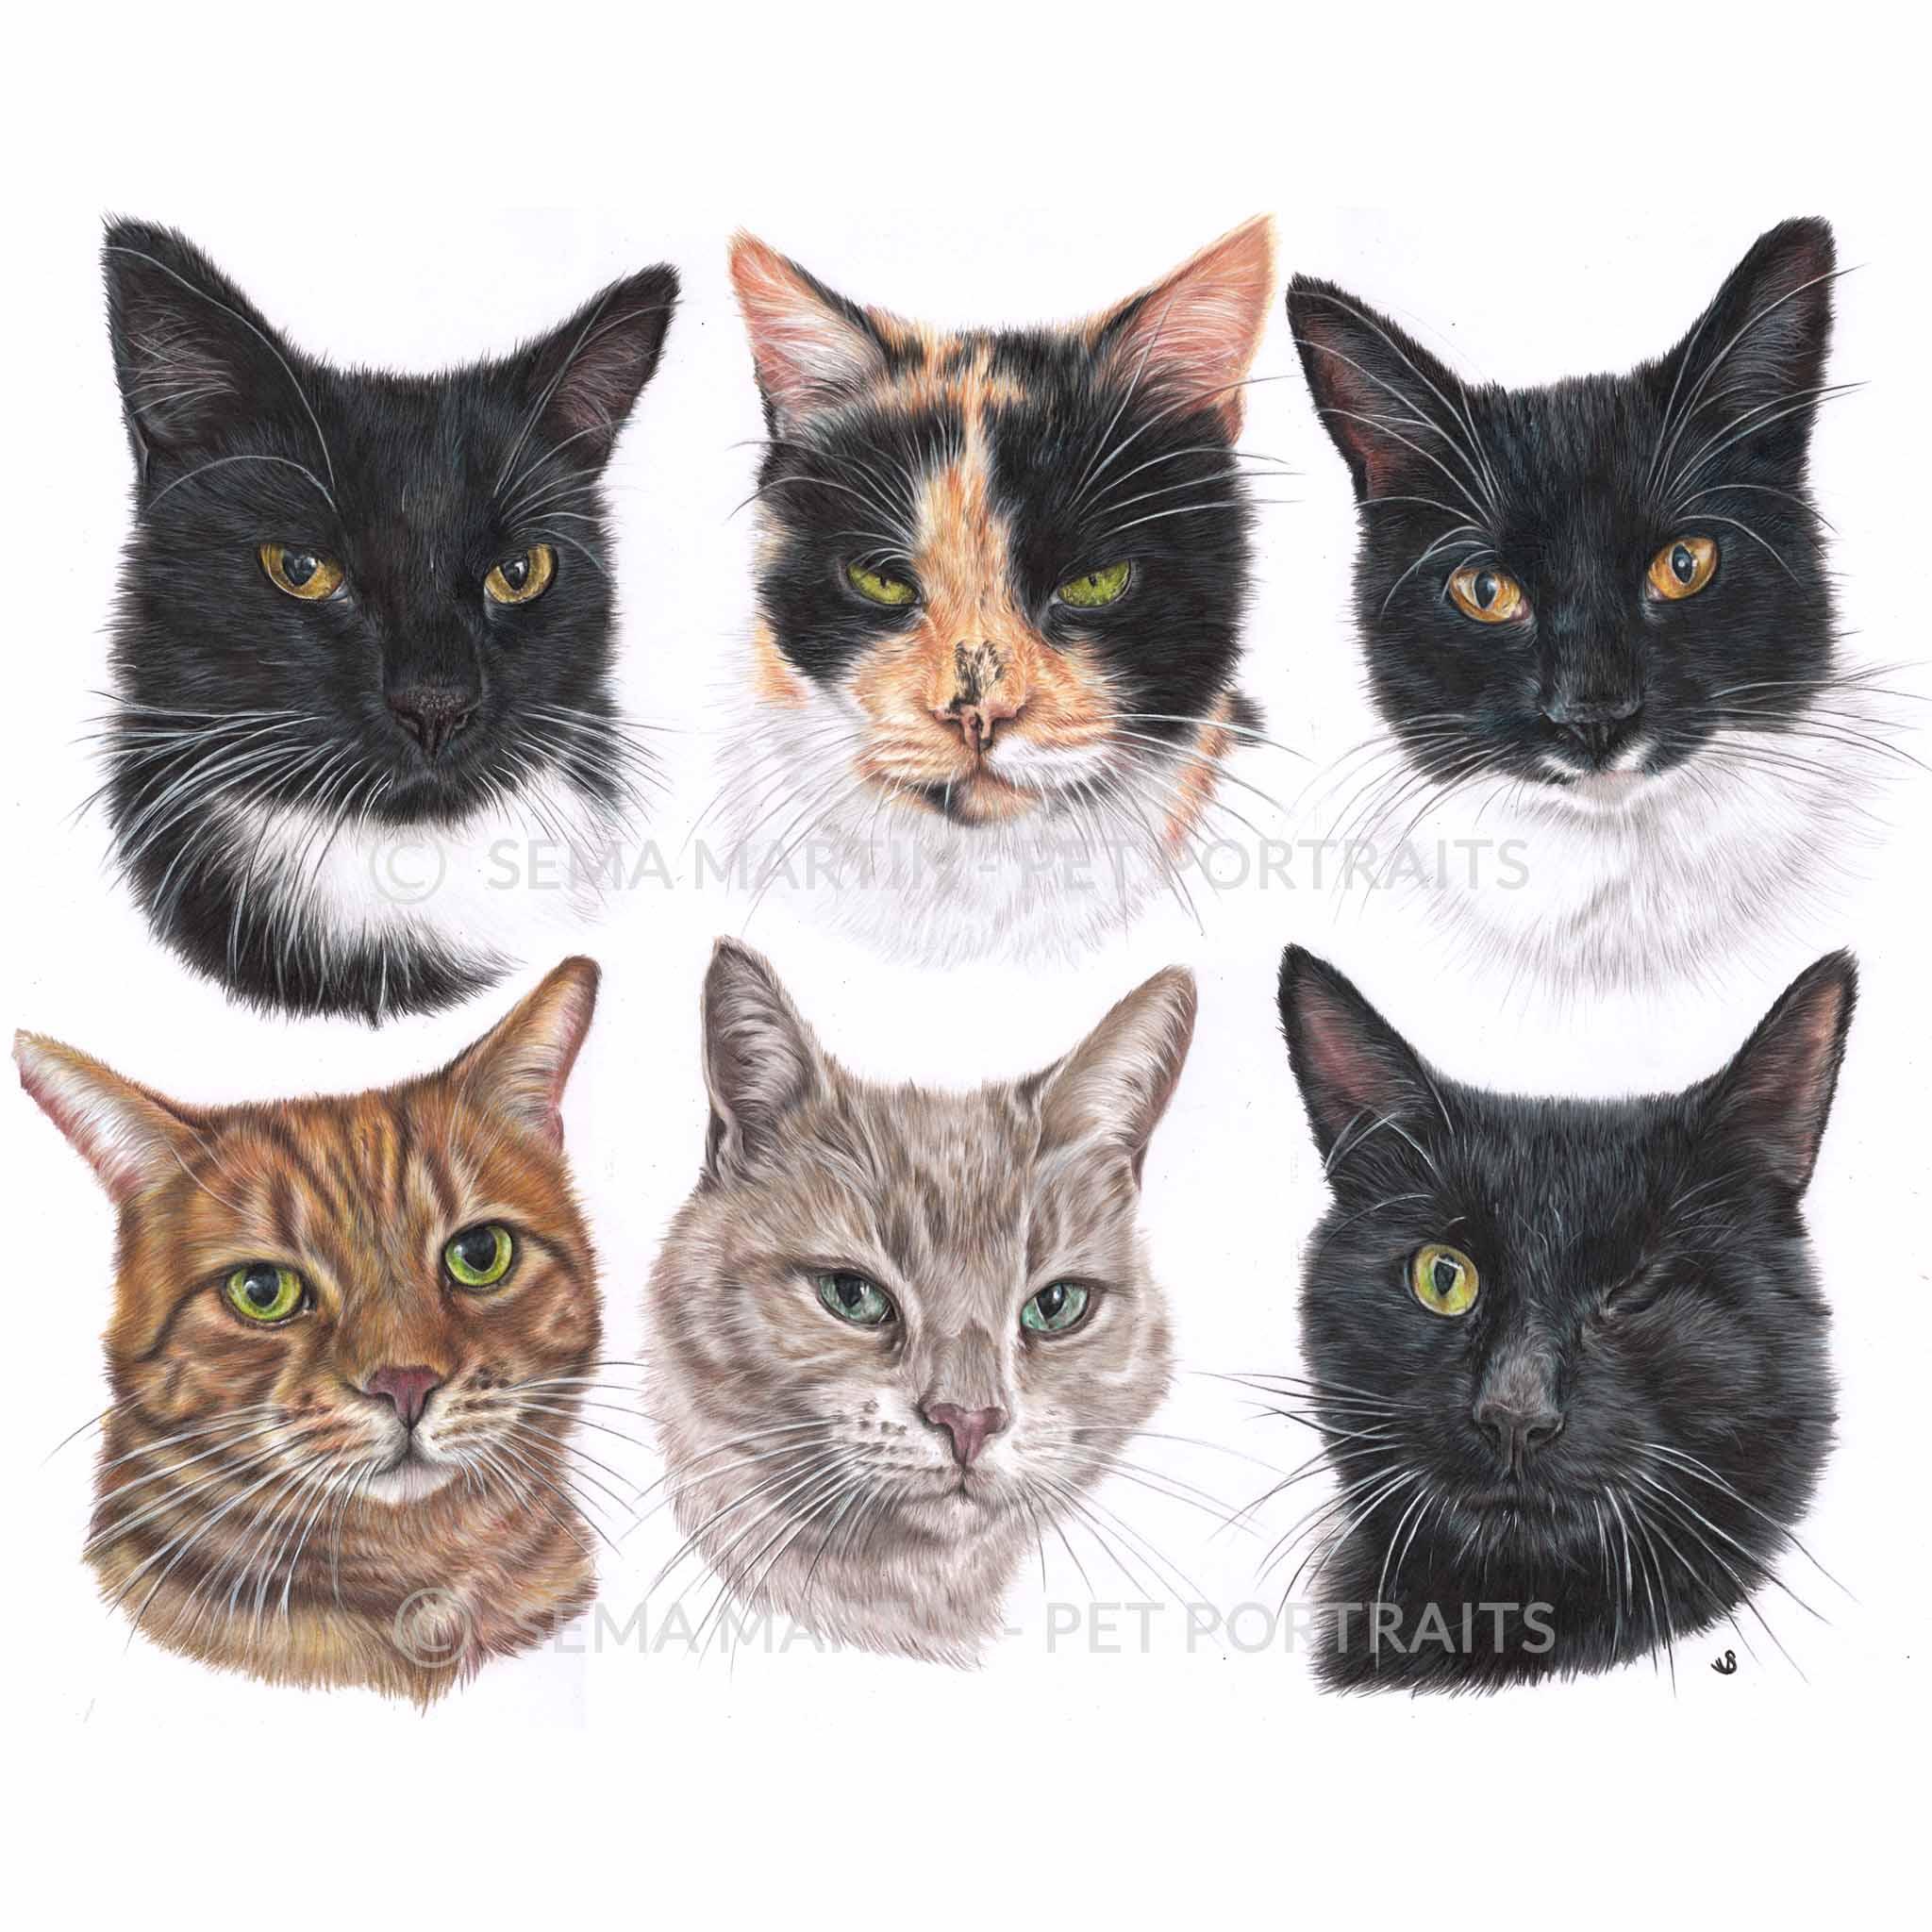 'Tia, Daisy, Smudge, Timmy, Gordon & Garfield' - UK, 23.4 x 16.5 inches, 2019